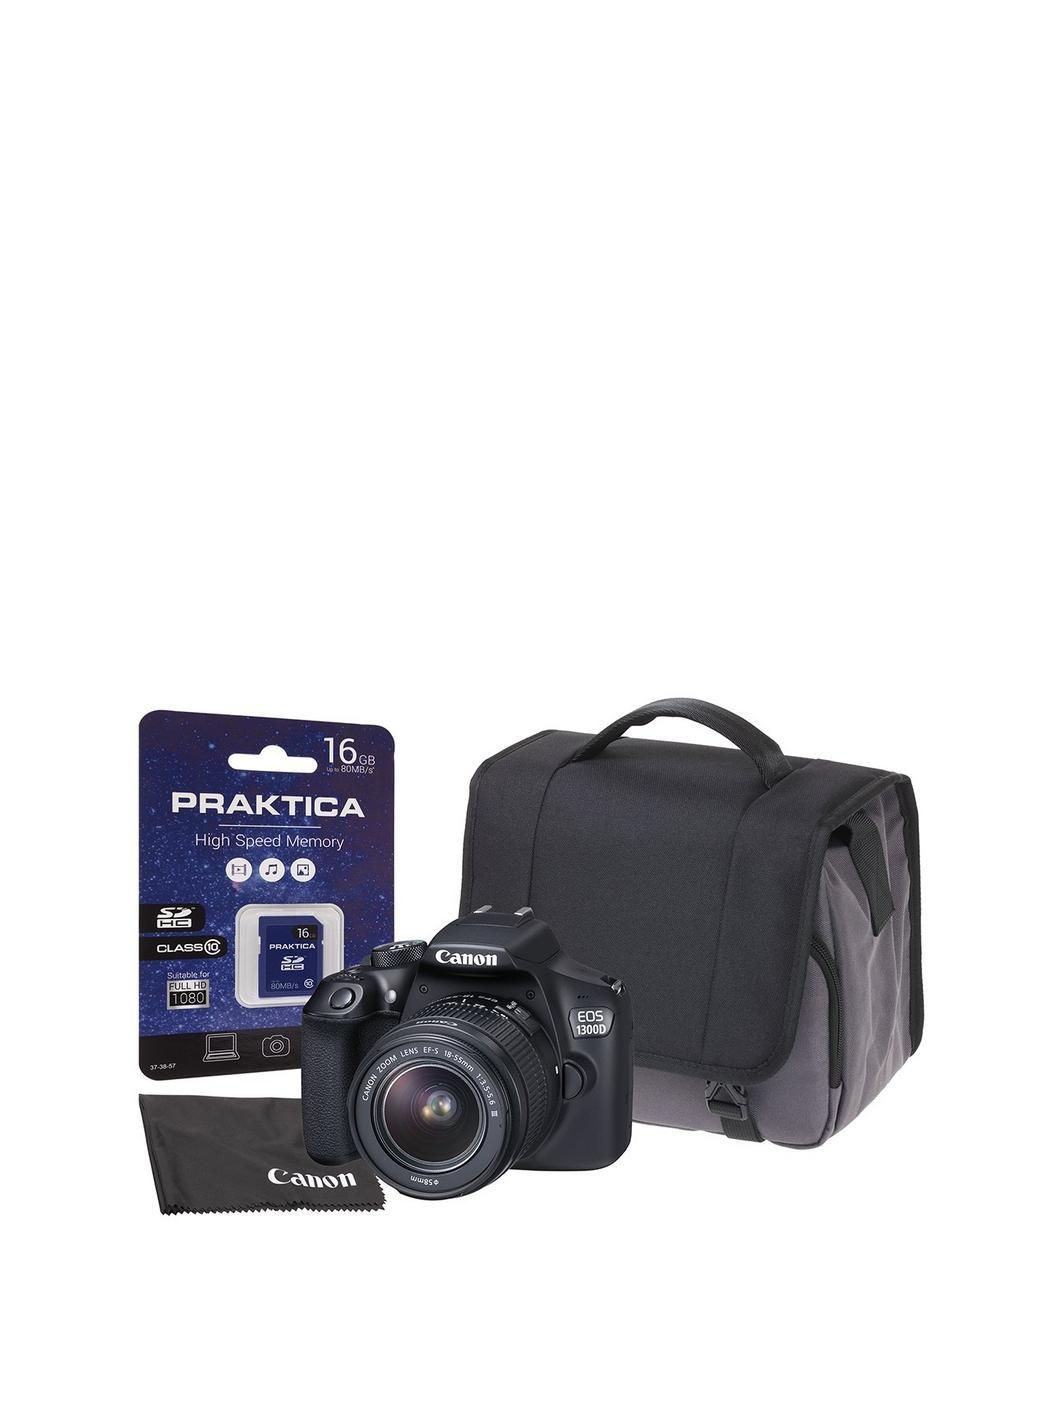 Eos 1300d Slr Kit Inc 18 55mm Dc Iii Lens 16gb Sd Cloth Kamera Canon 55